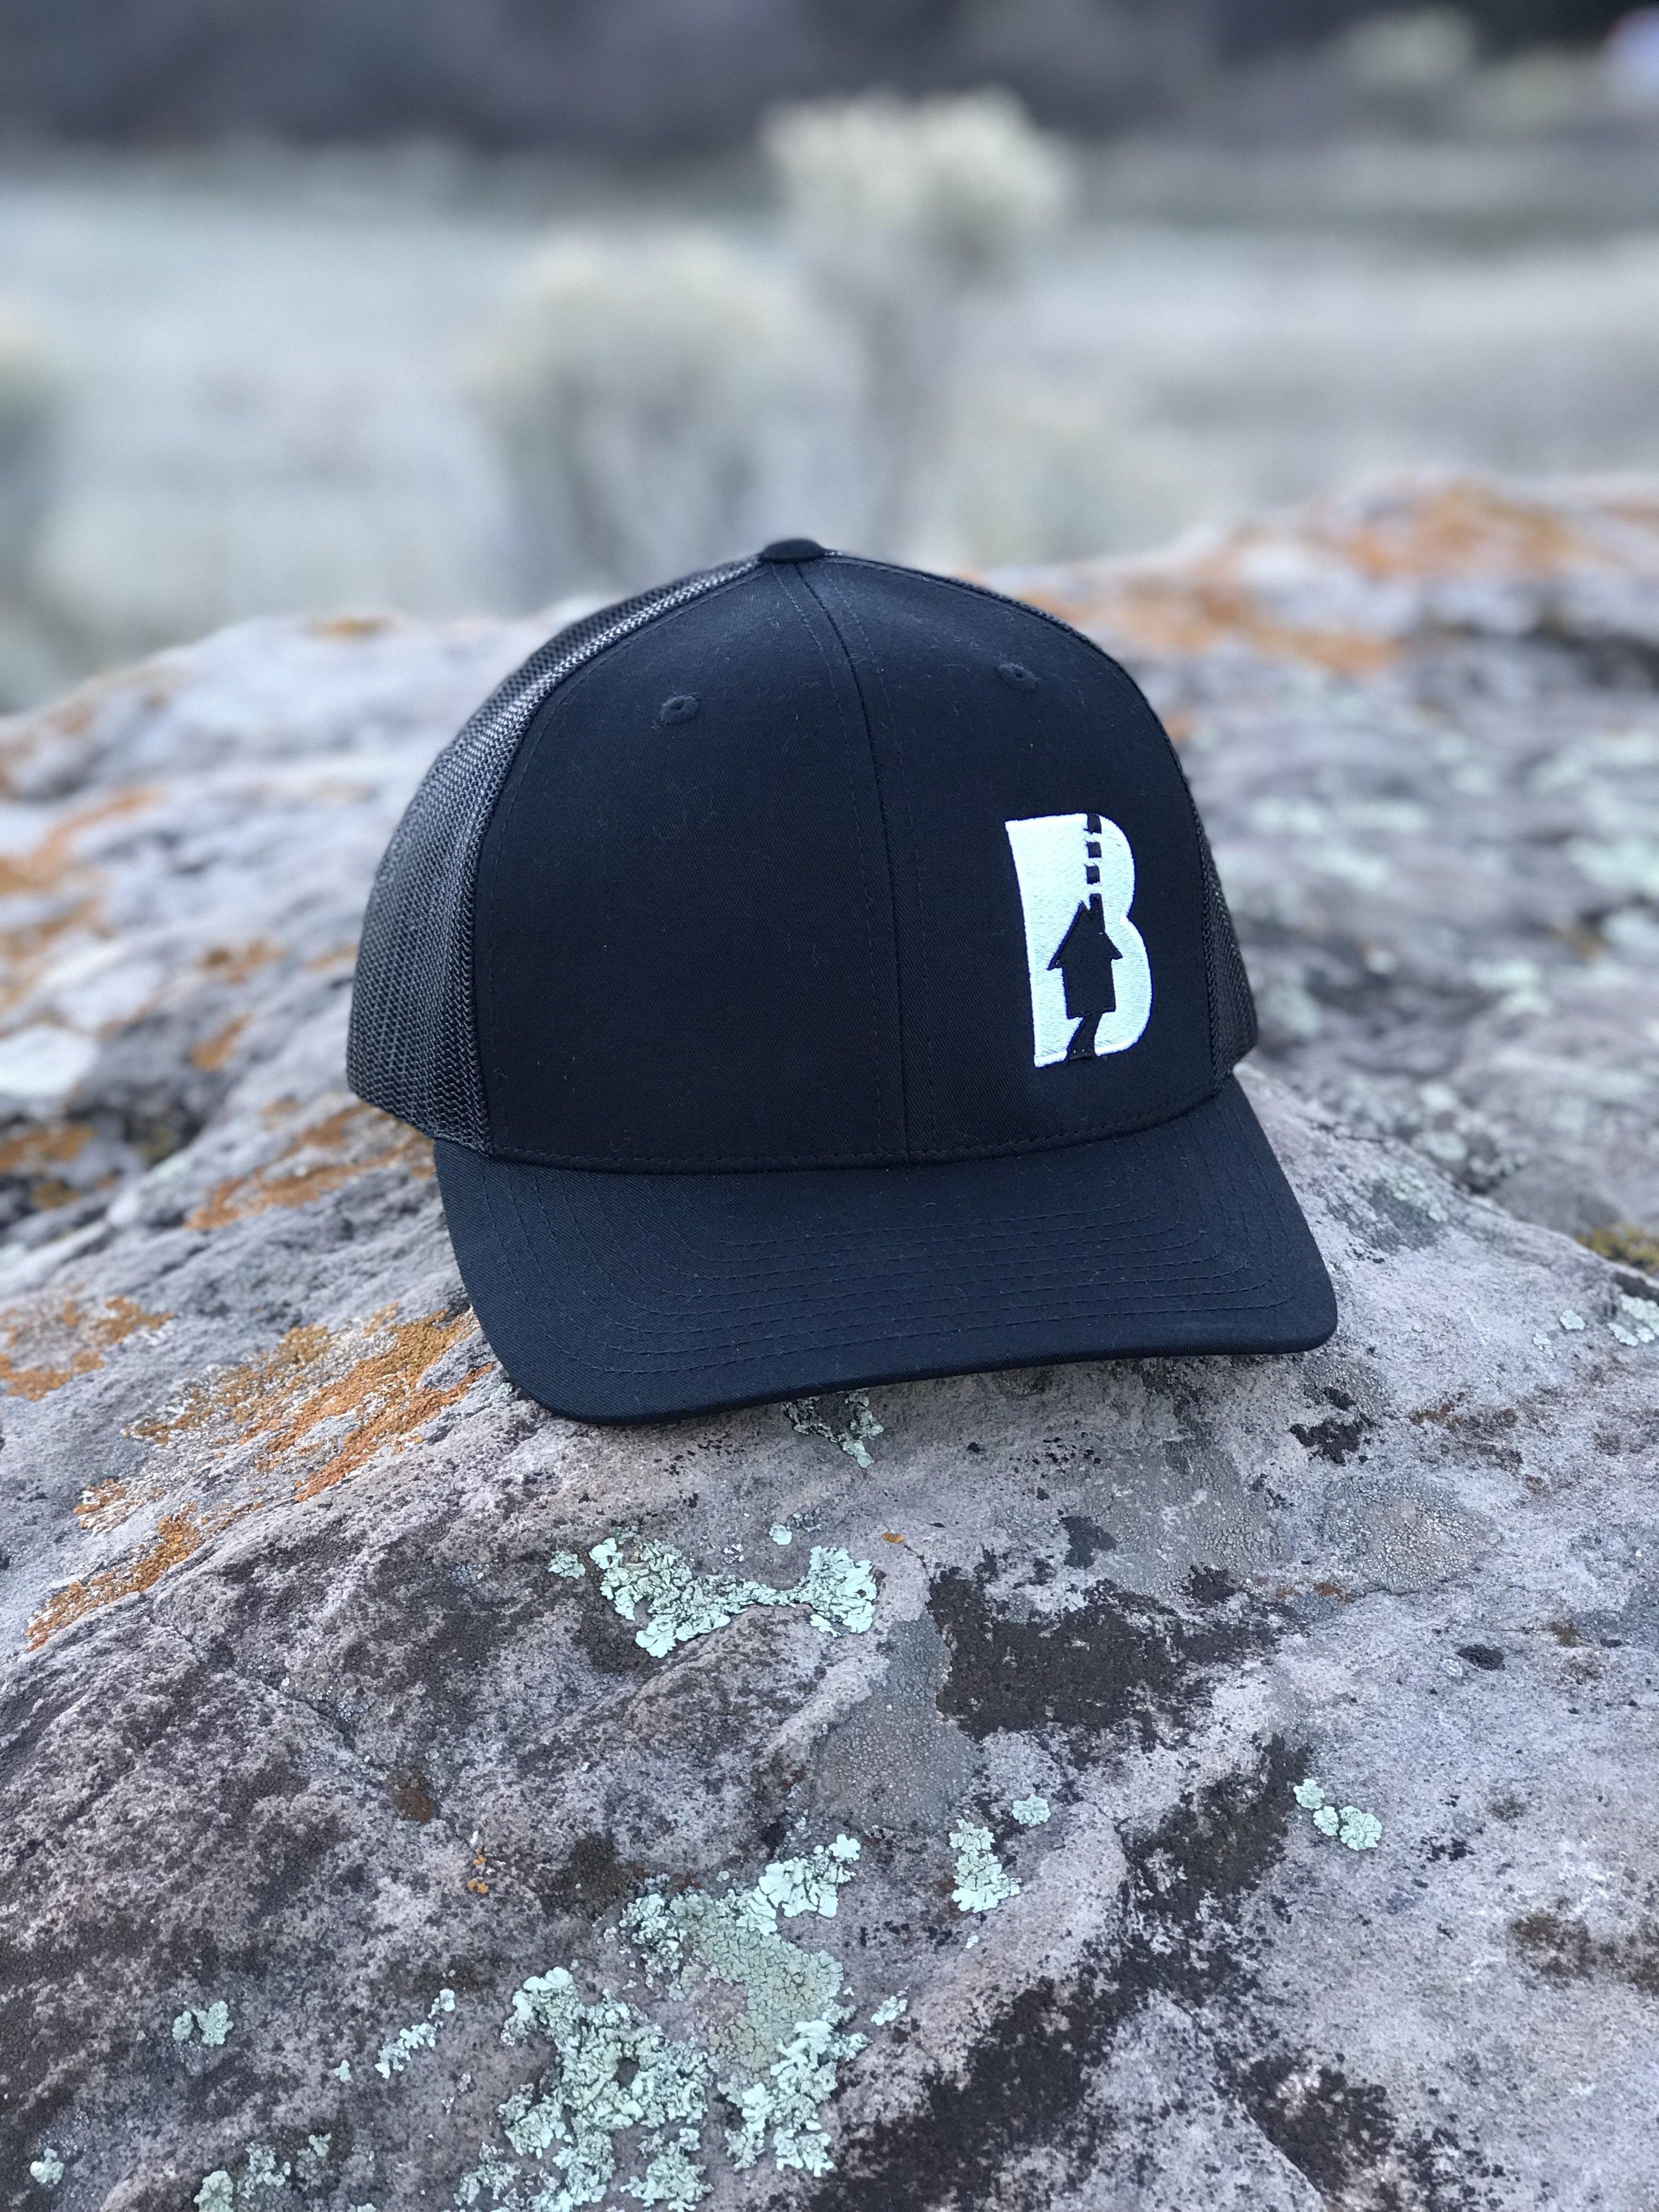 Bauen Group Snapback Hat